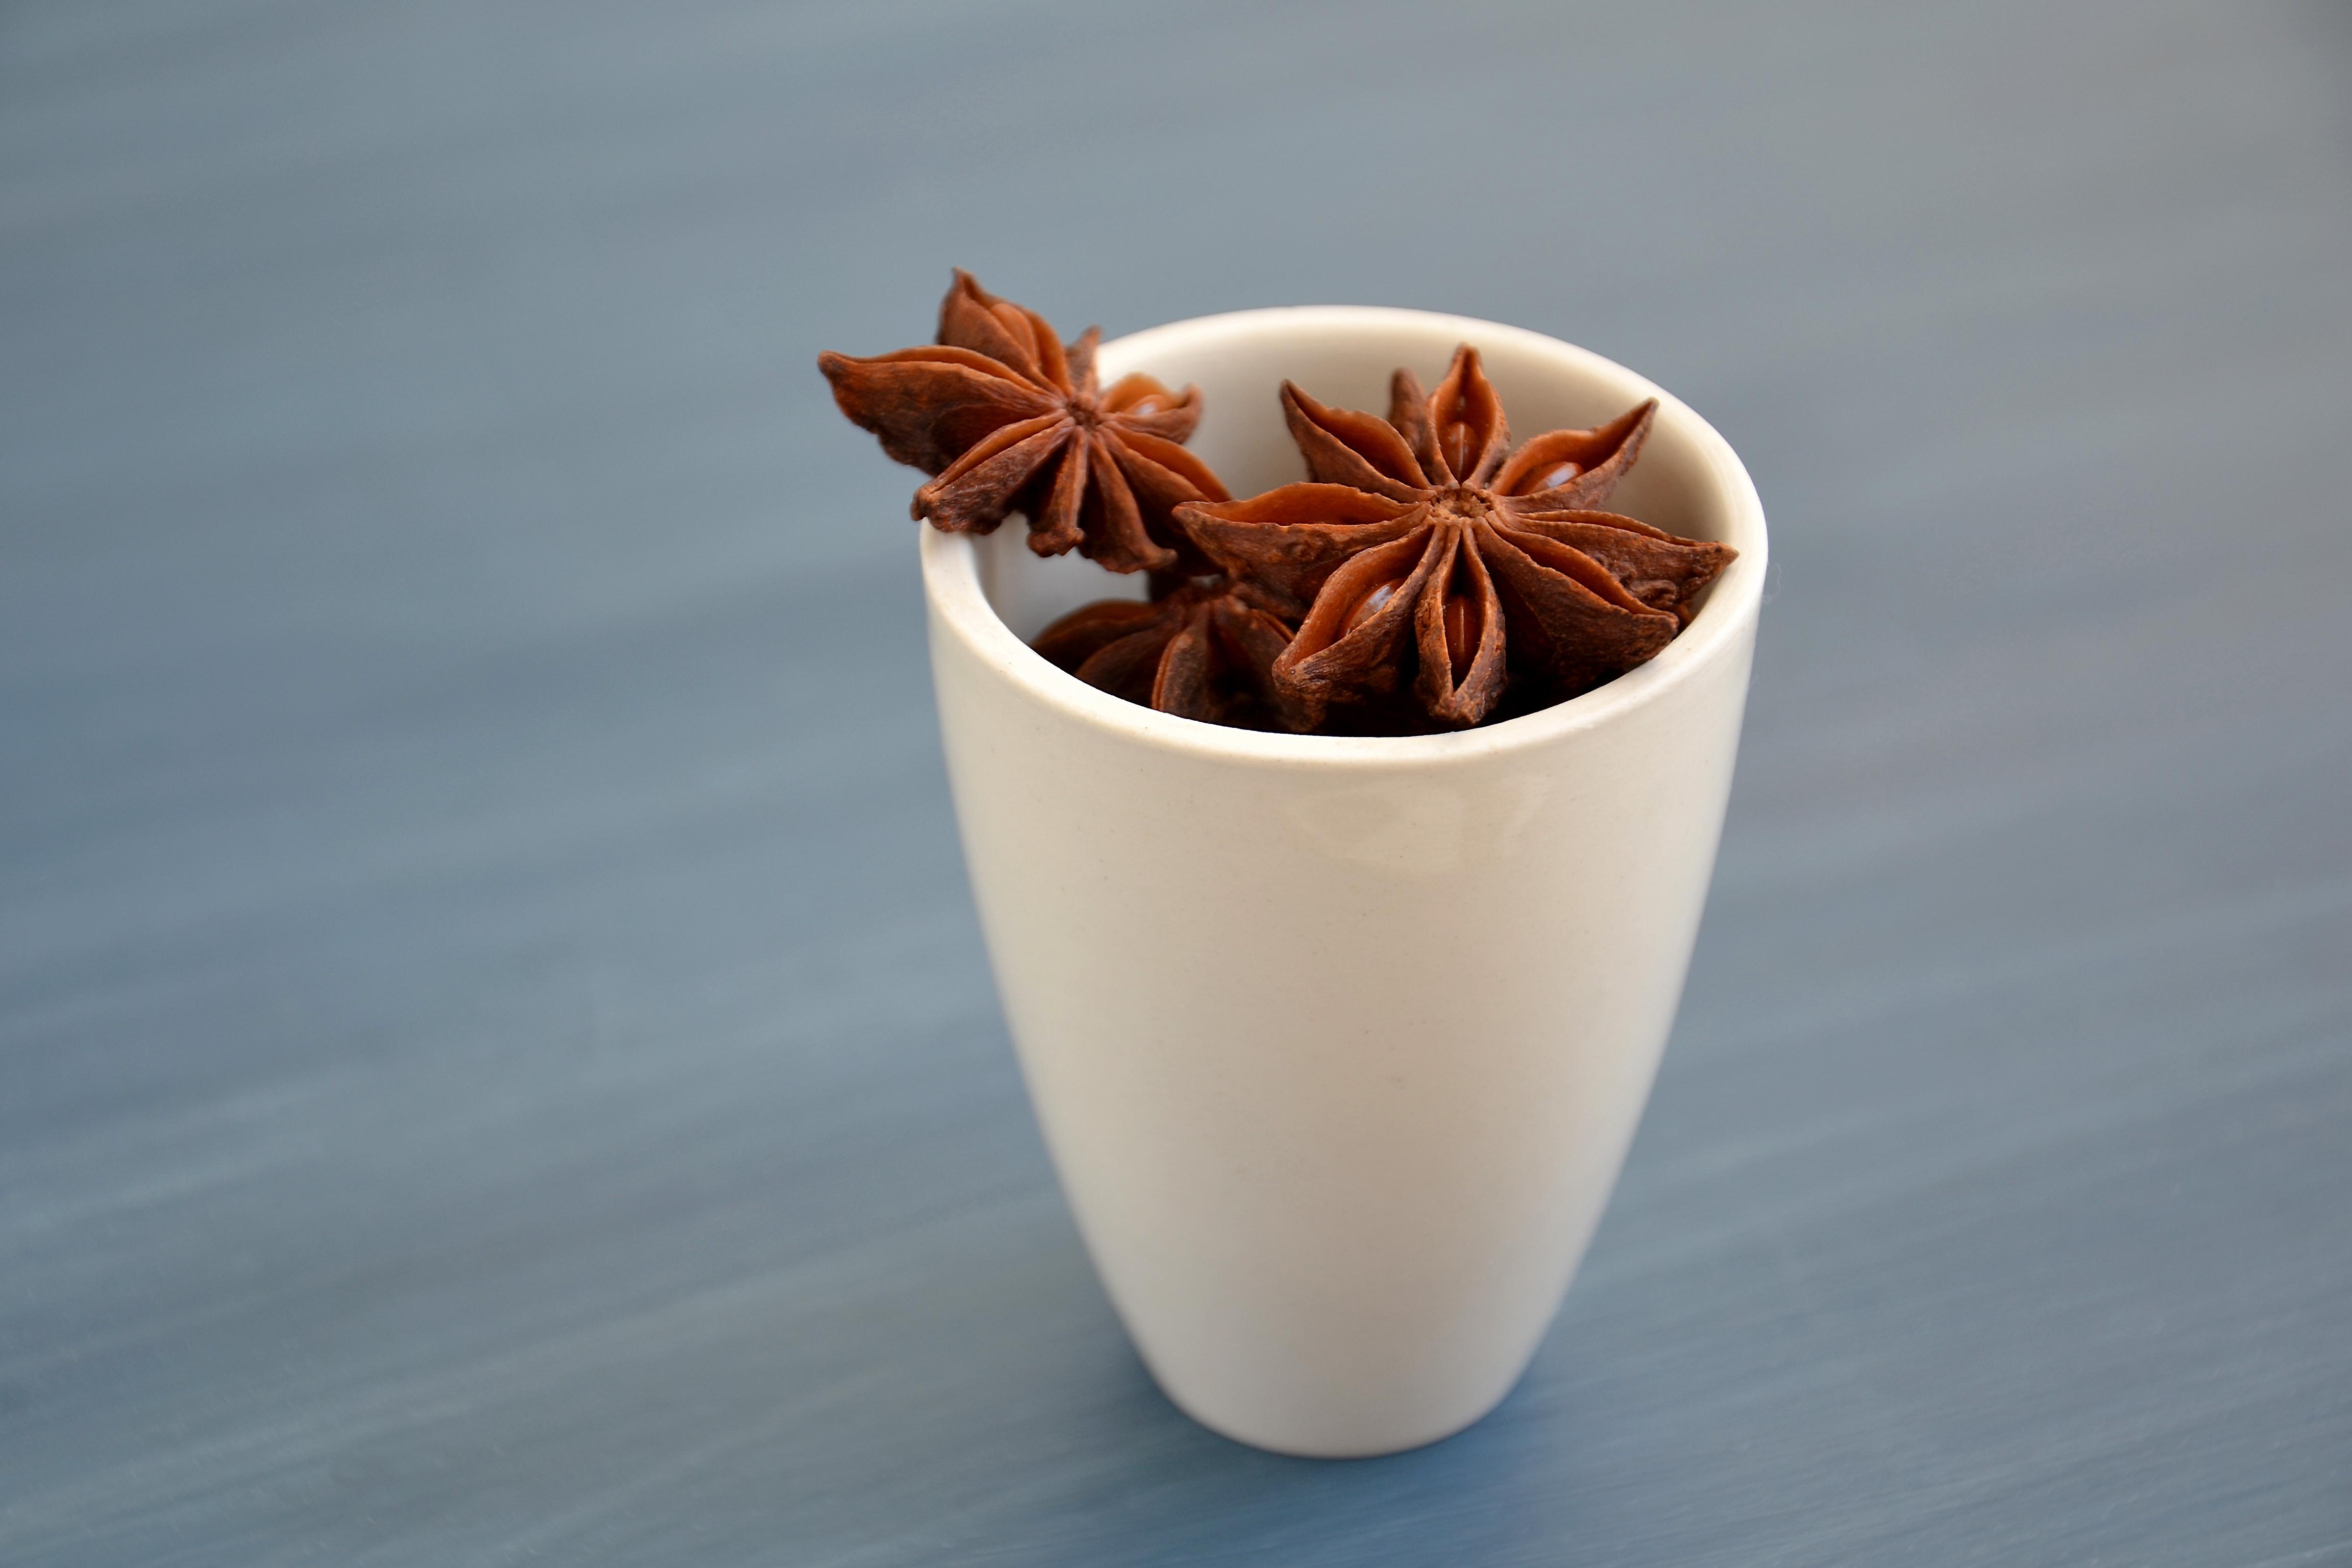 Images Gratuites Epices Ingredients Cuisine Fragrance Anis